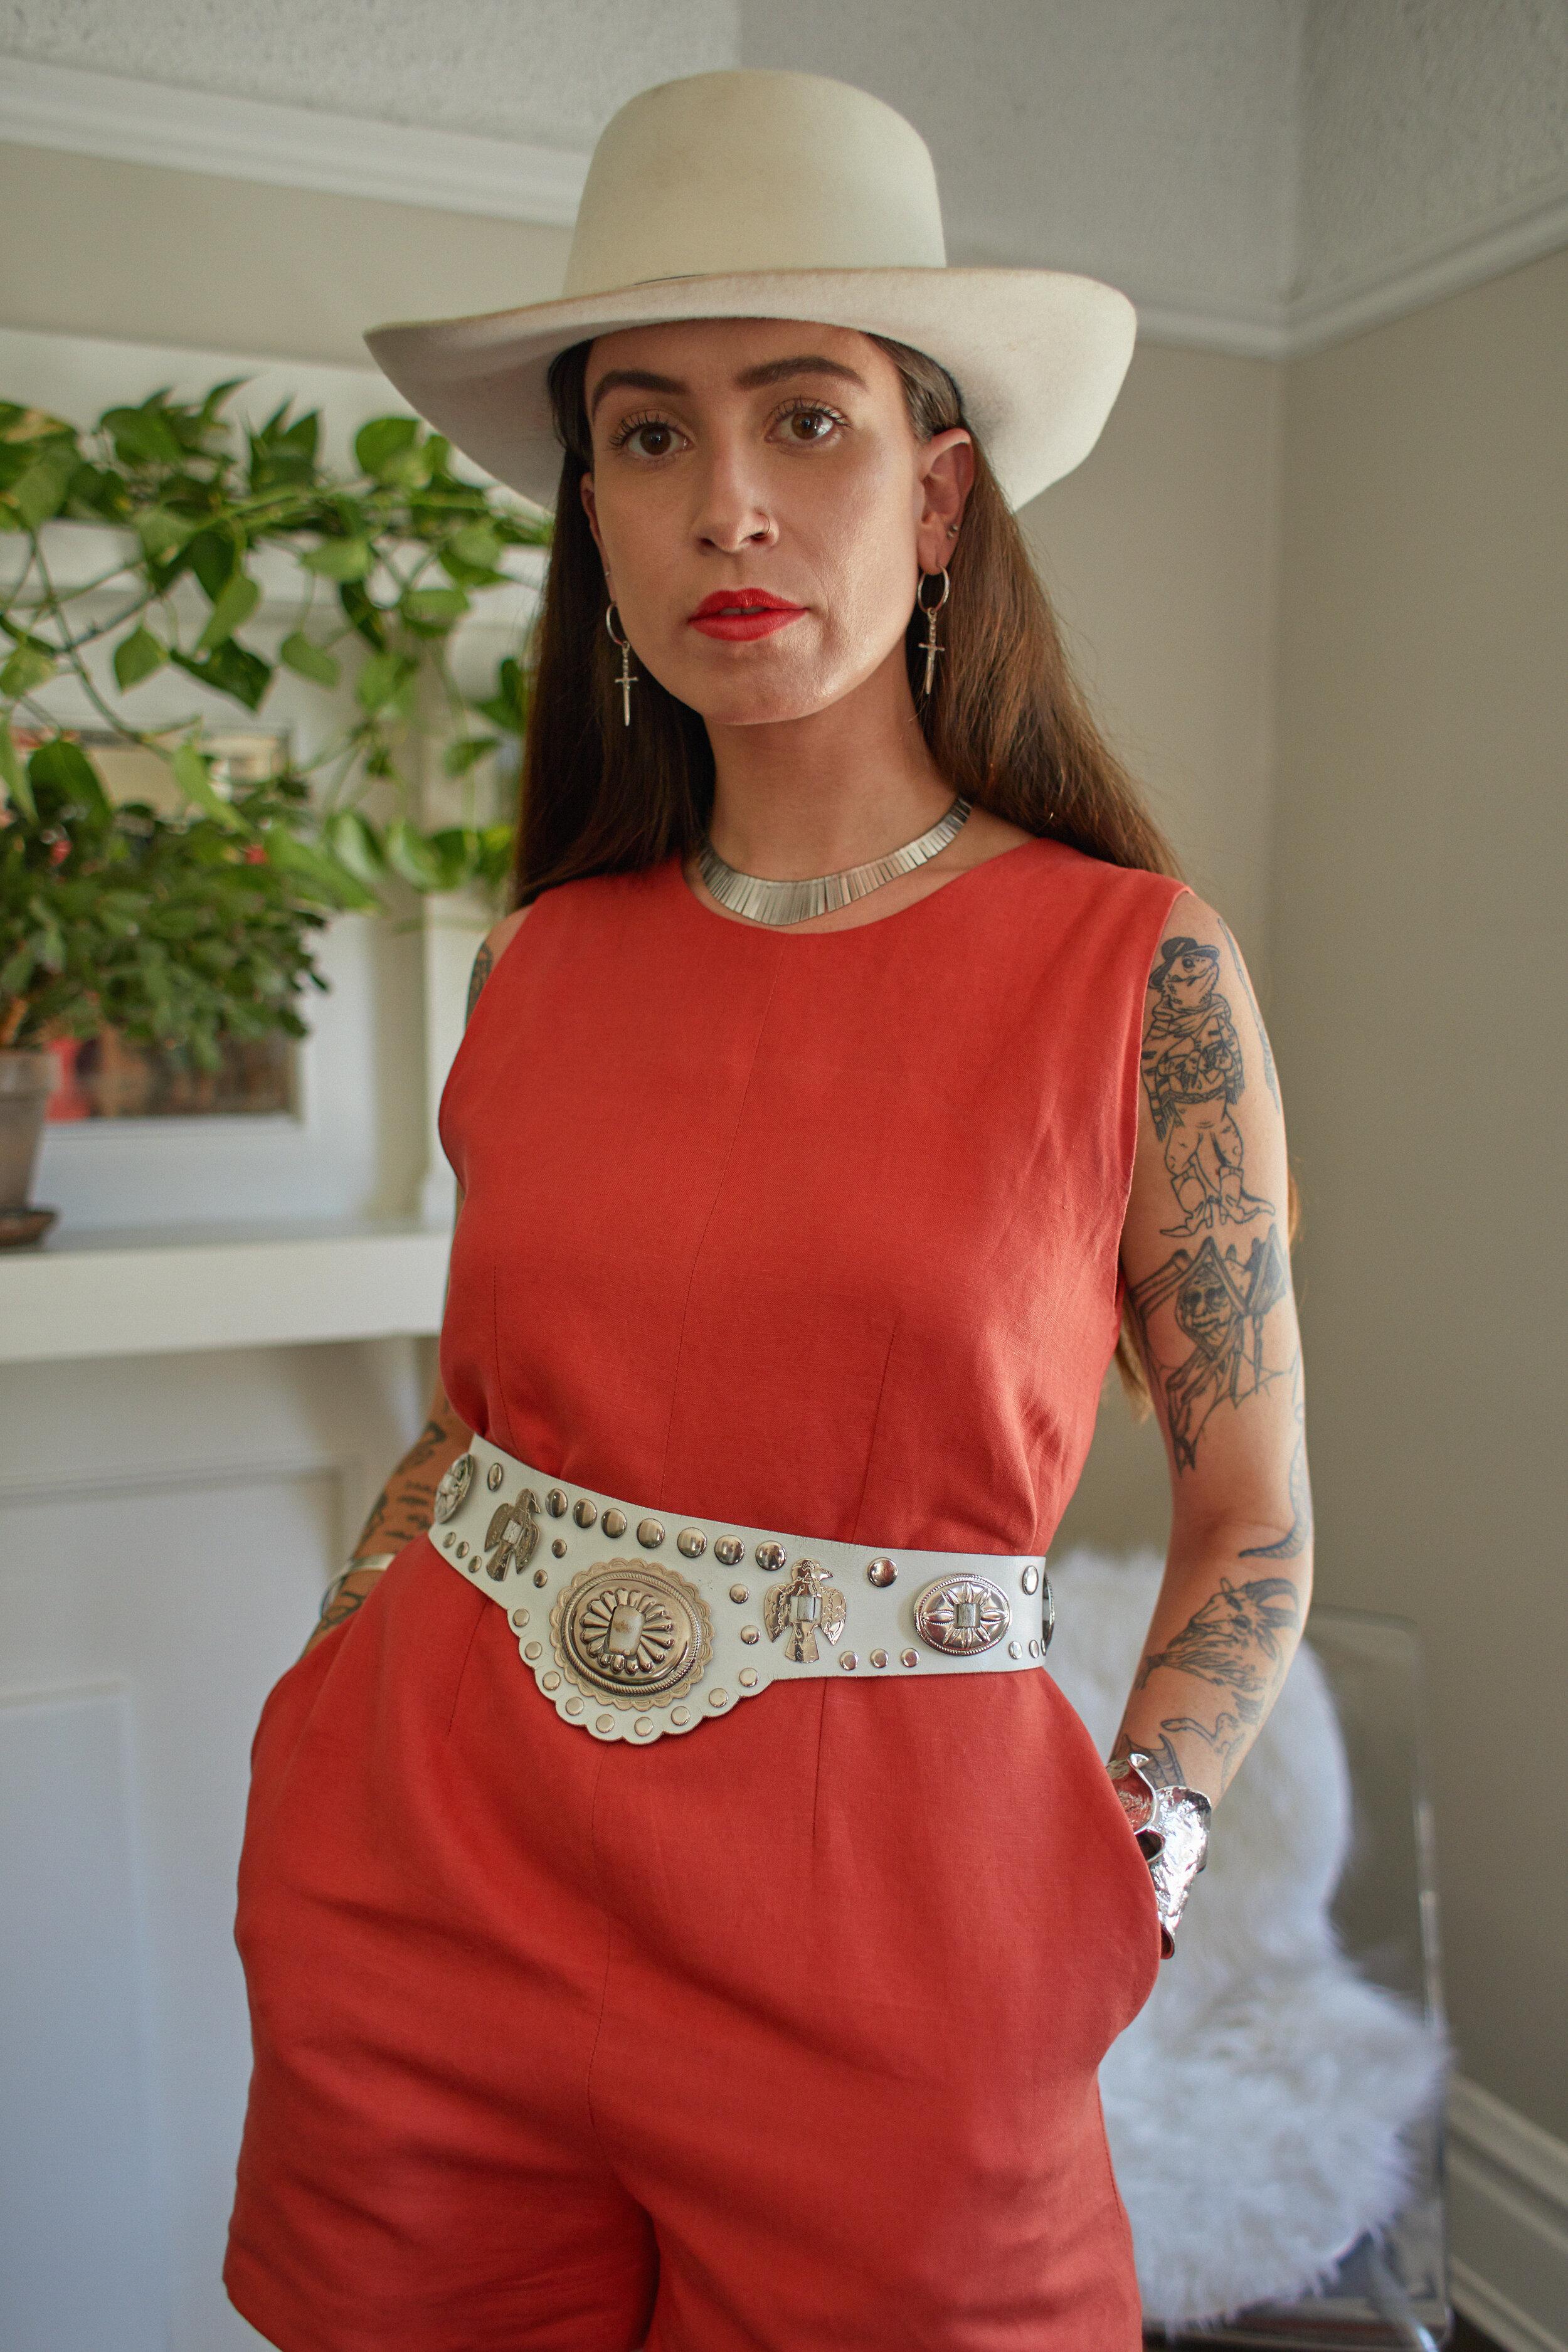 Rayanne for Sew Nicole • Photographer - Denis Gutiérrez-Ogrinc • Stylist - Taylor Stan • Make Up - Natalie Edwards •